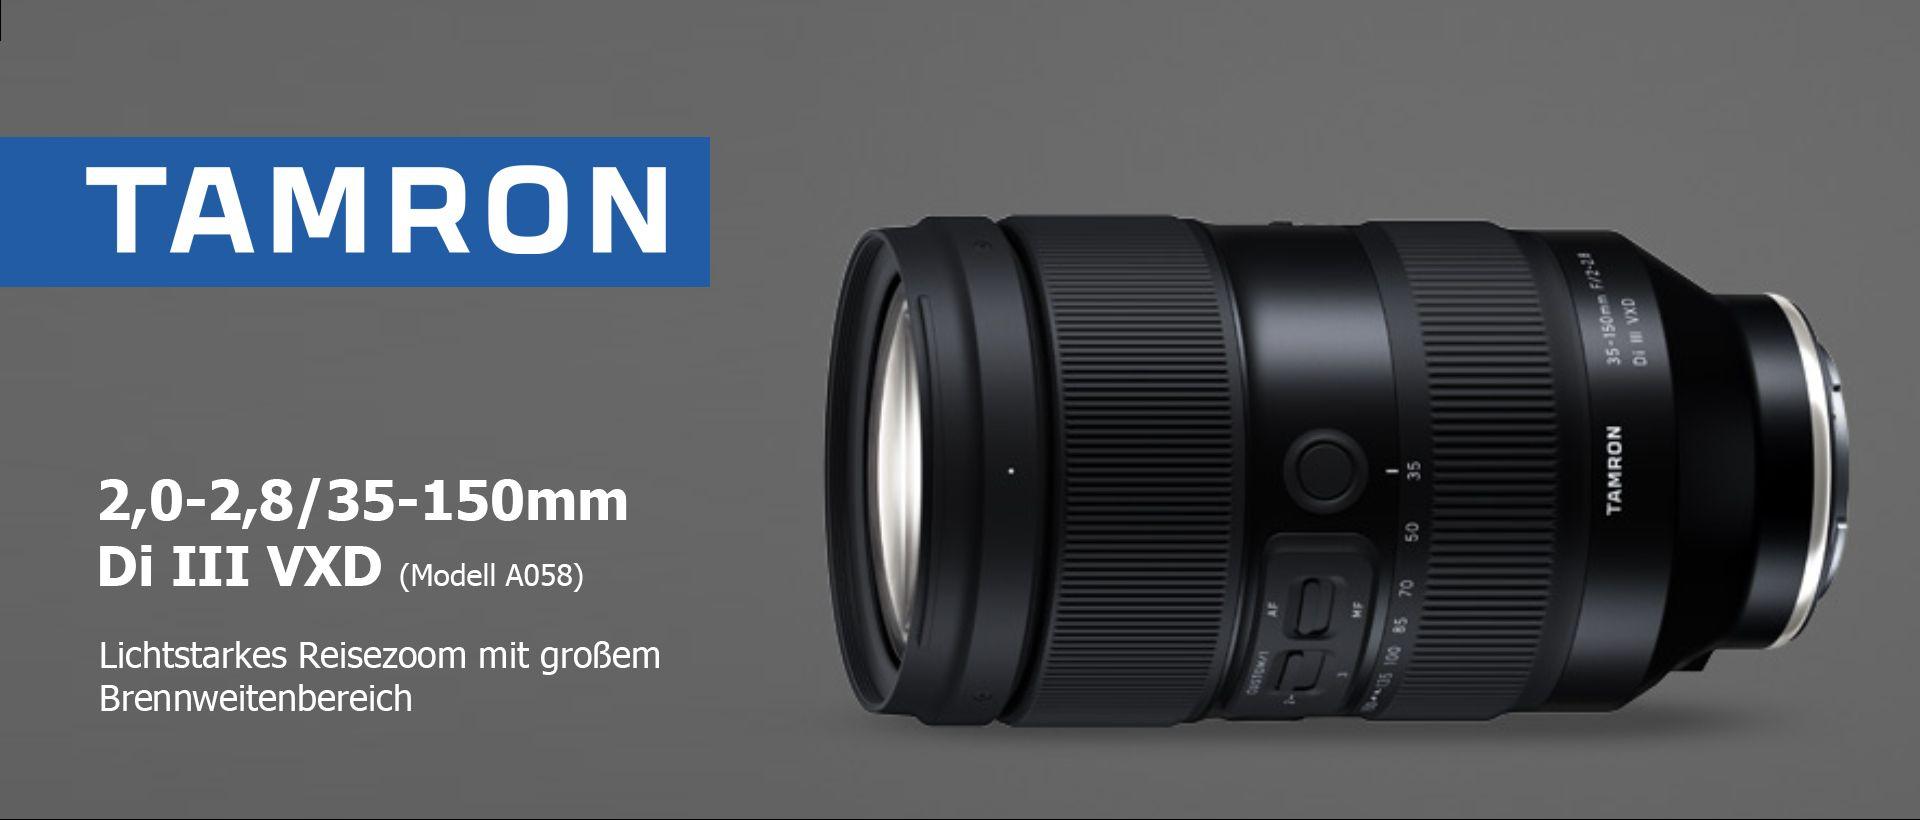 Tamron 2,0-2,8/35-150mm Di III VXD (Modell A058)